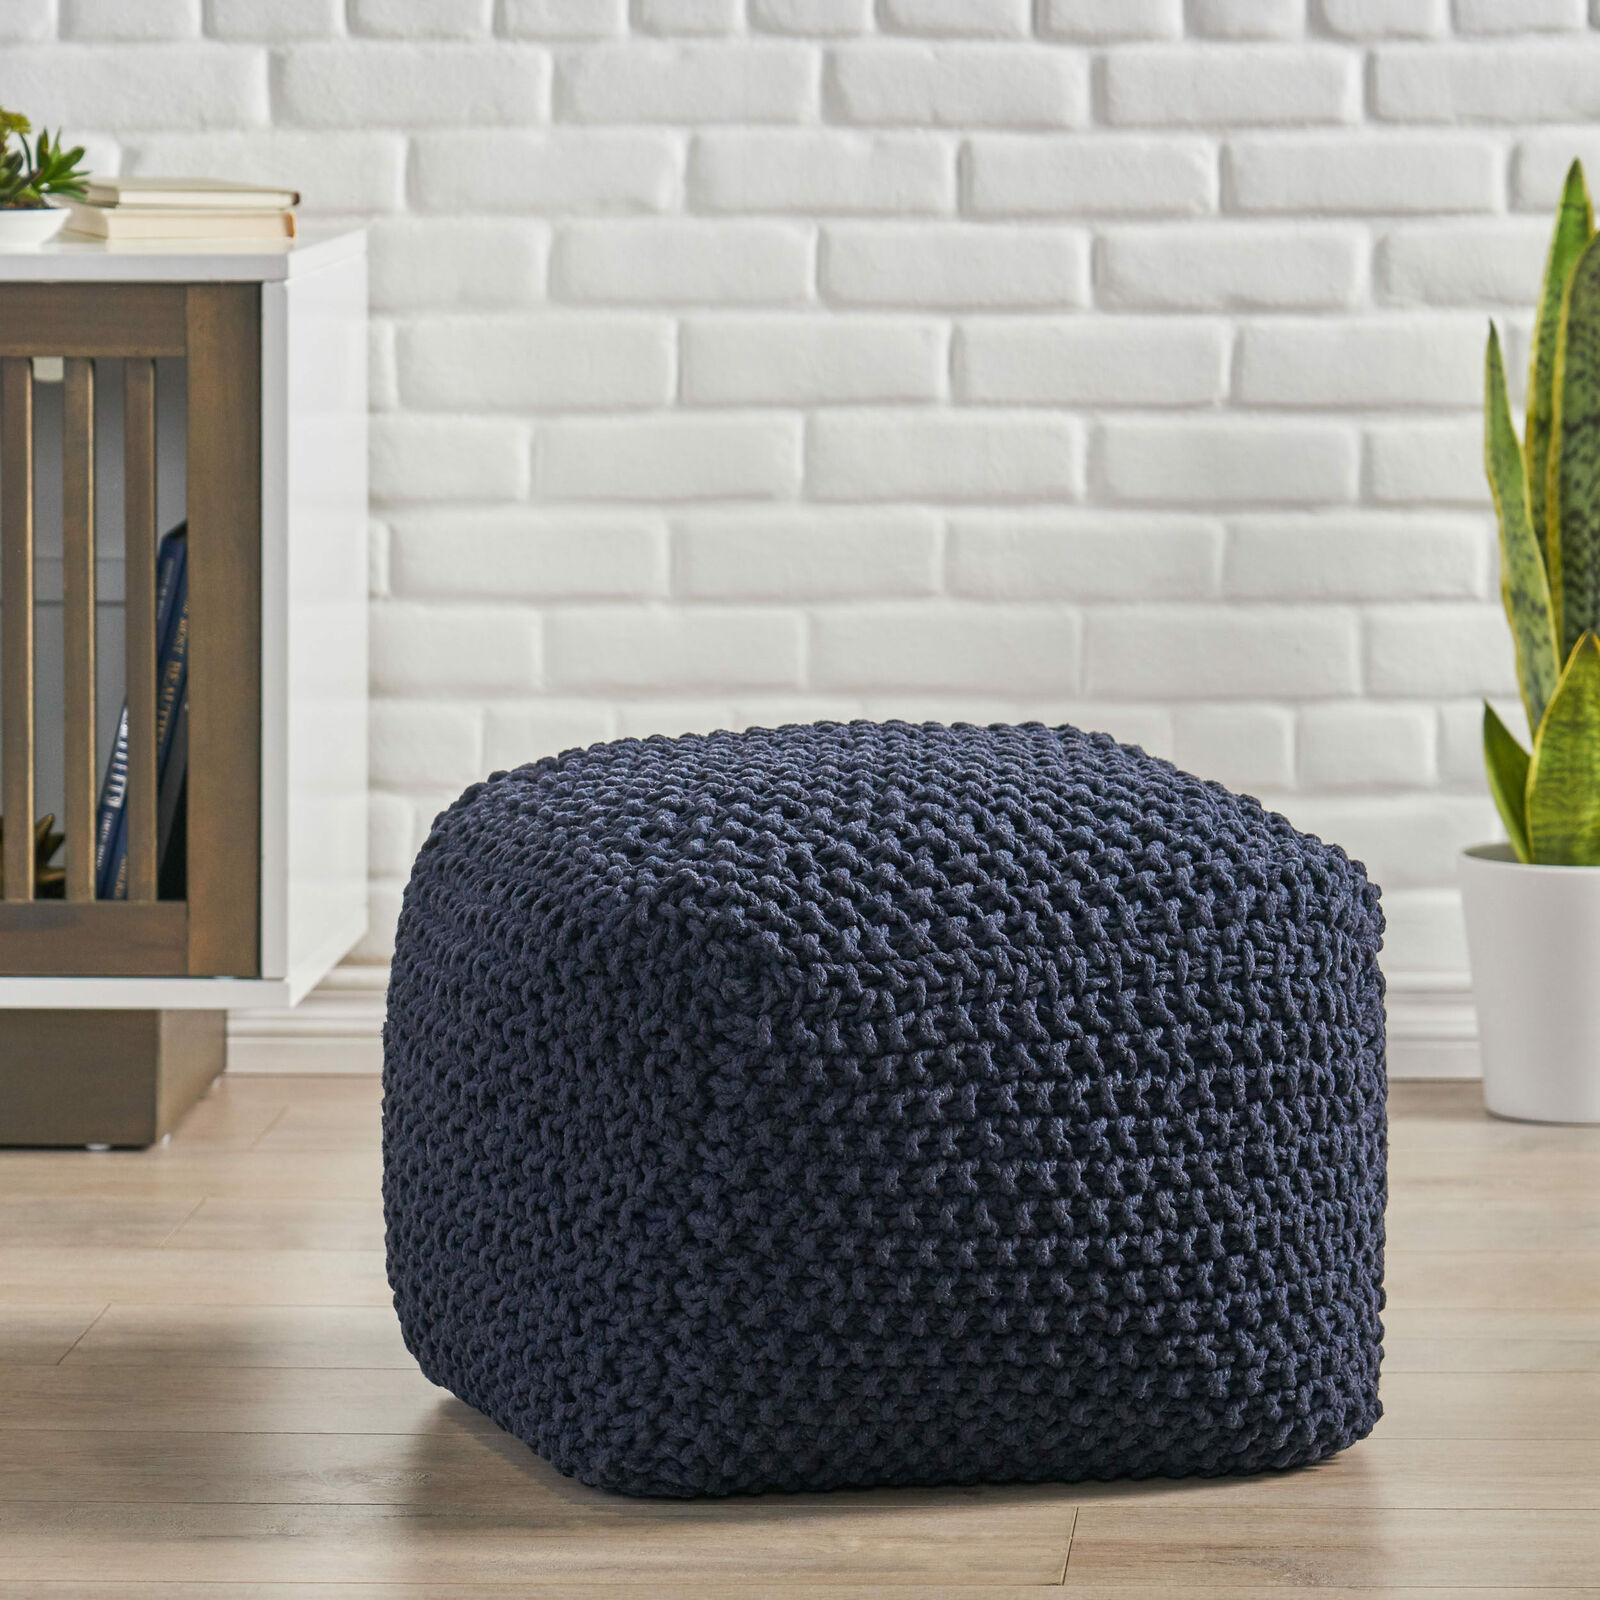 Teresa Modern Knitted Cotton Cube Pouf Furniture